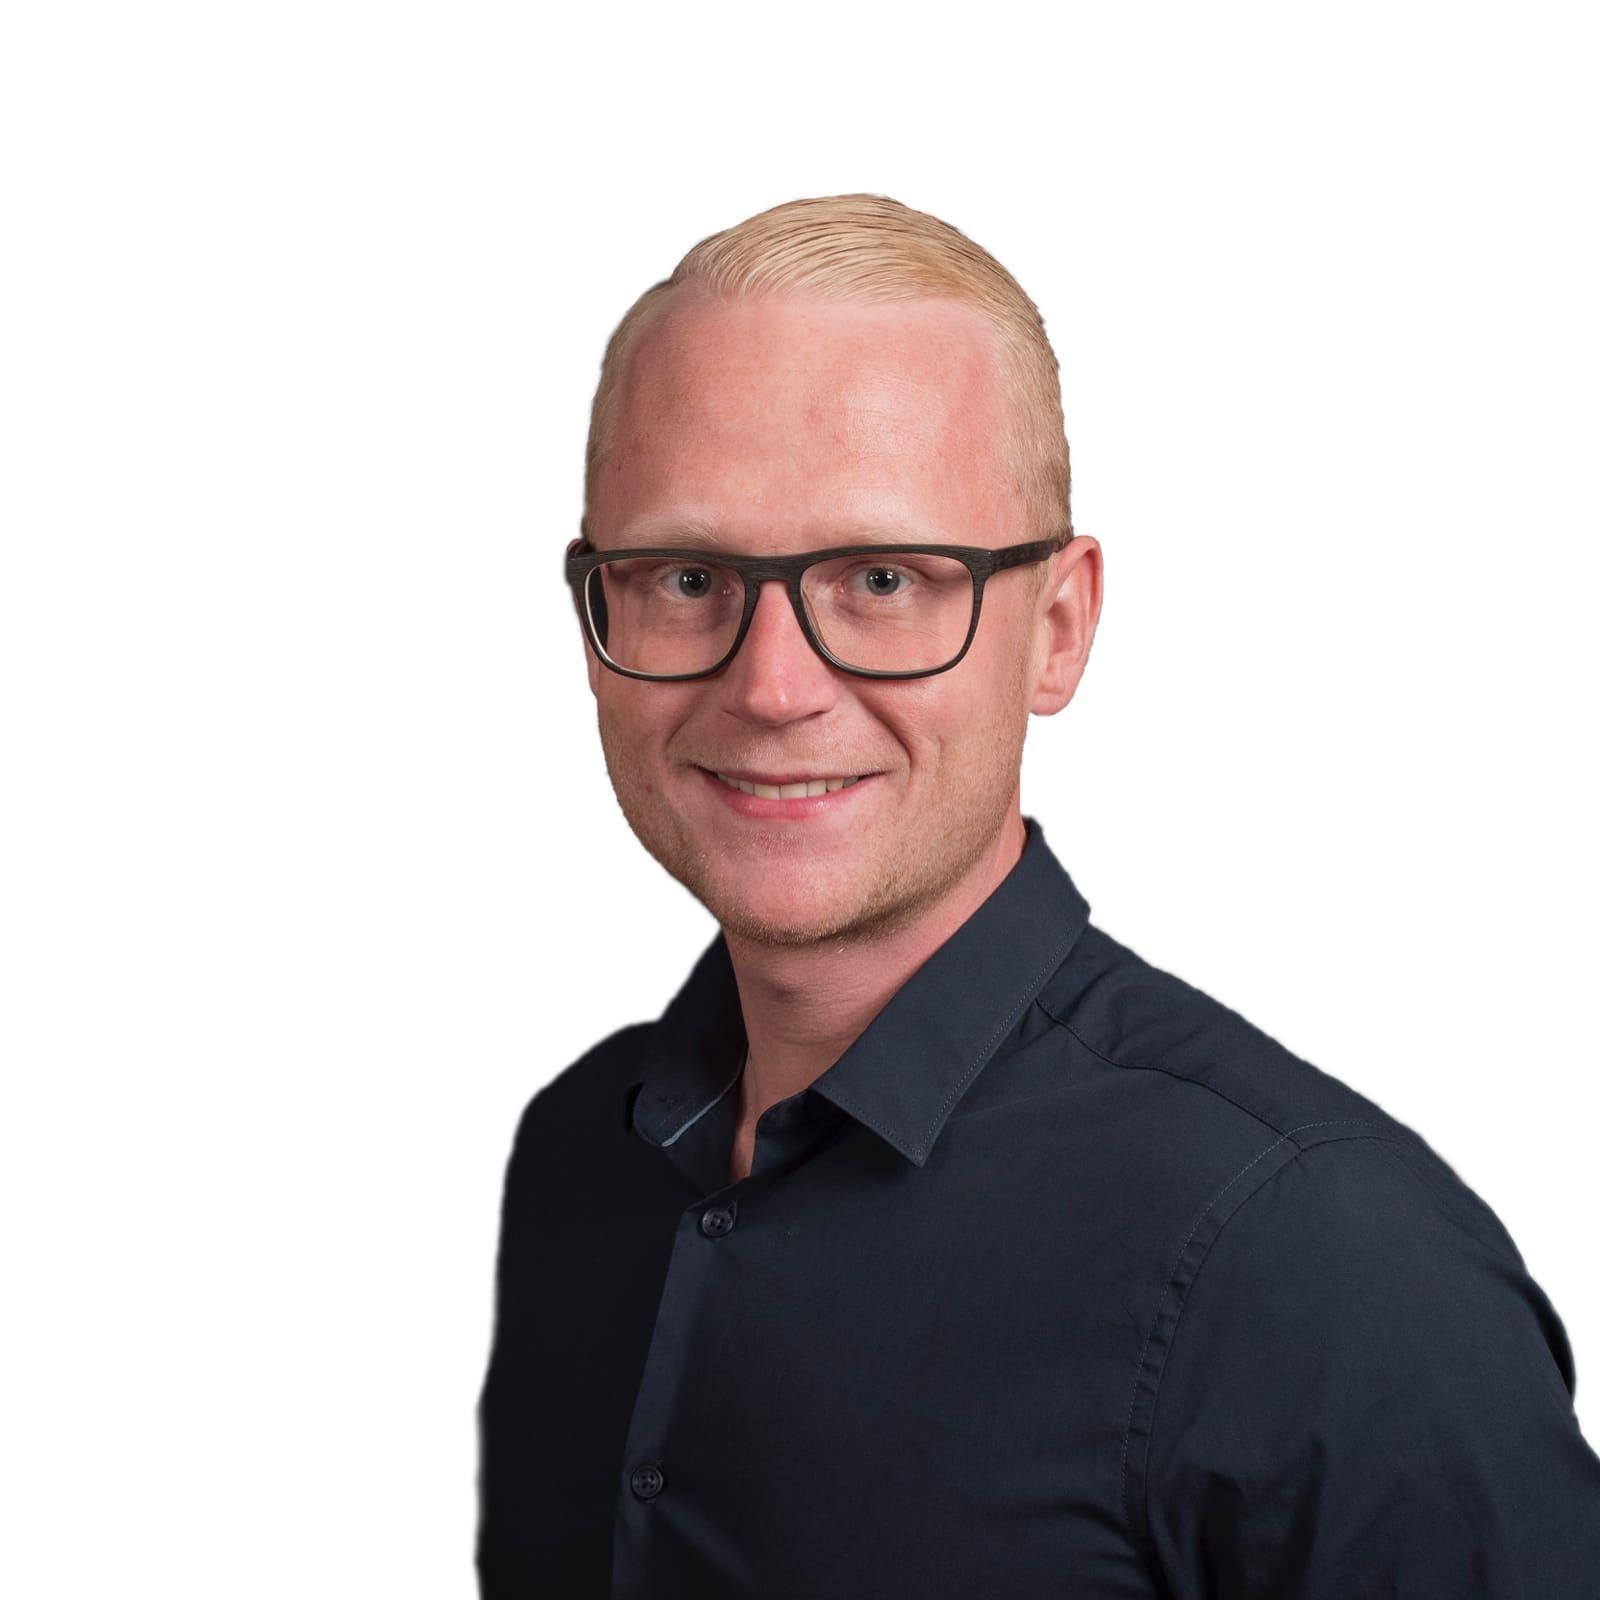 Yannick Goedhart - Boekhouder in Amersfoort